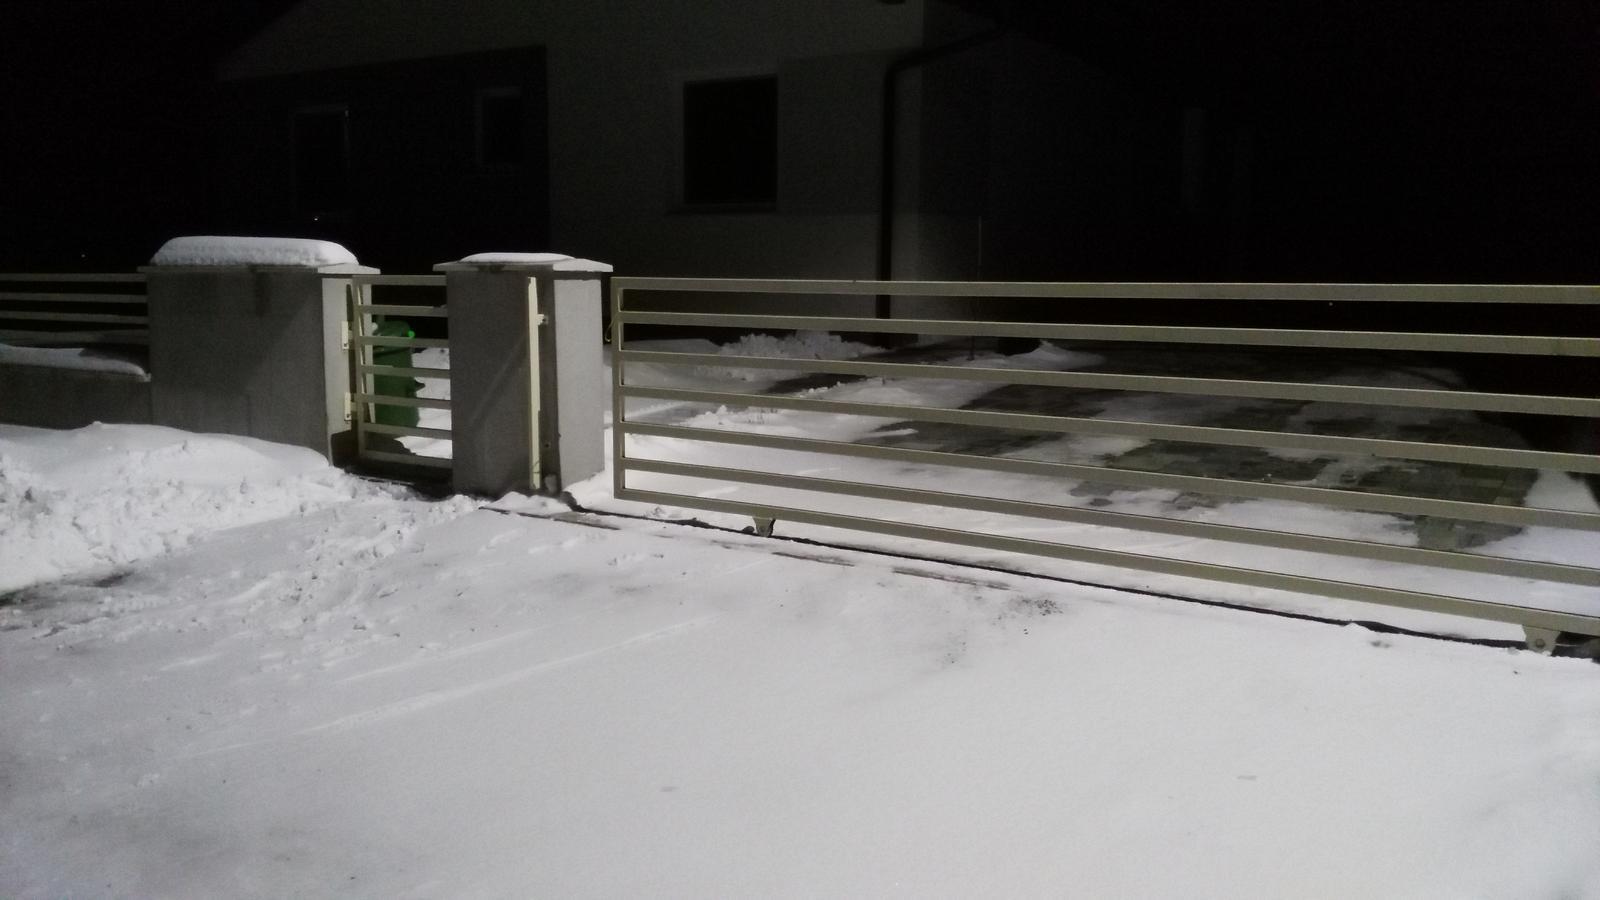 Domček na kopčeku - snezi a snezi